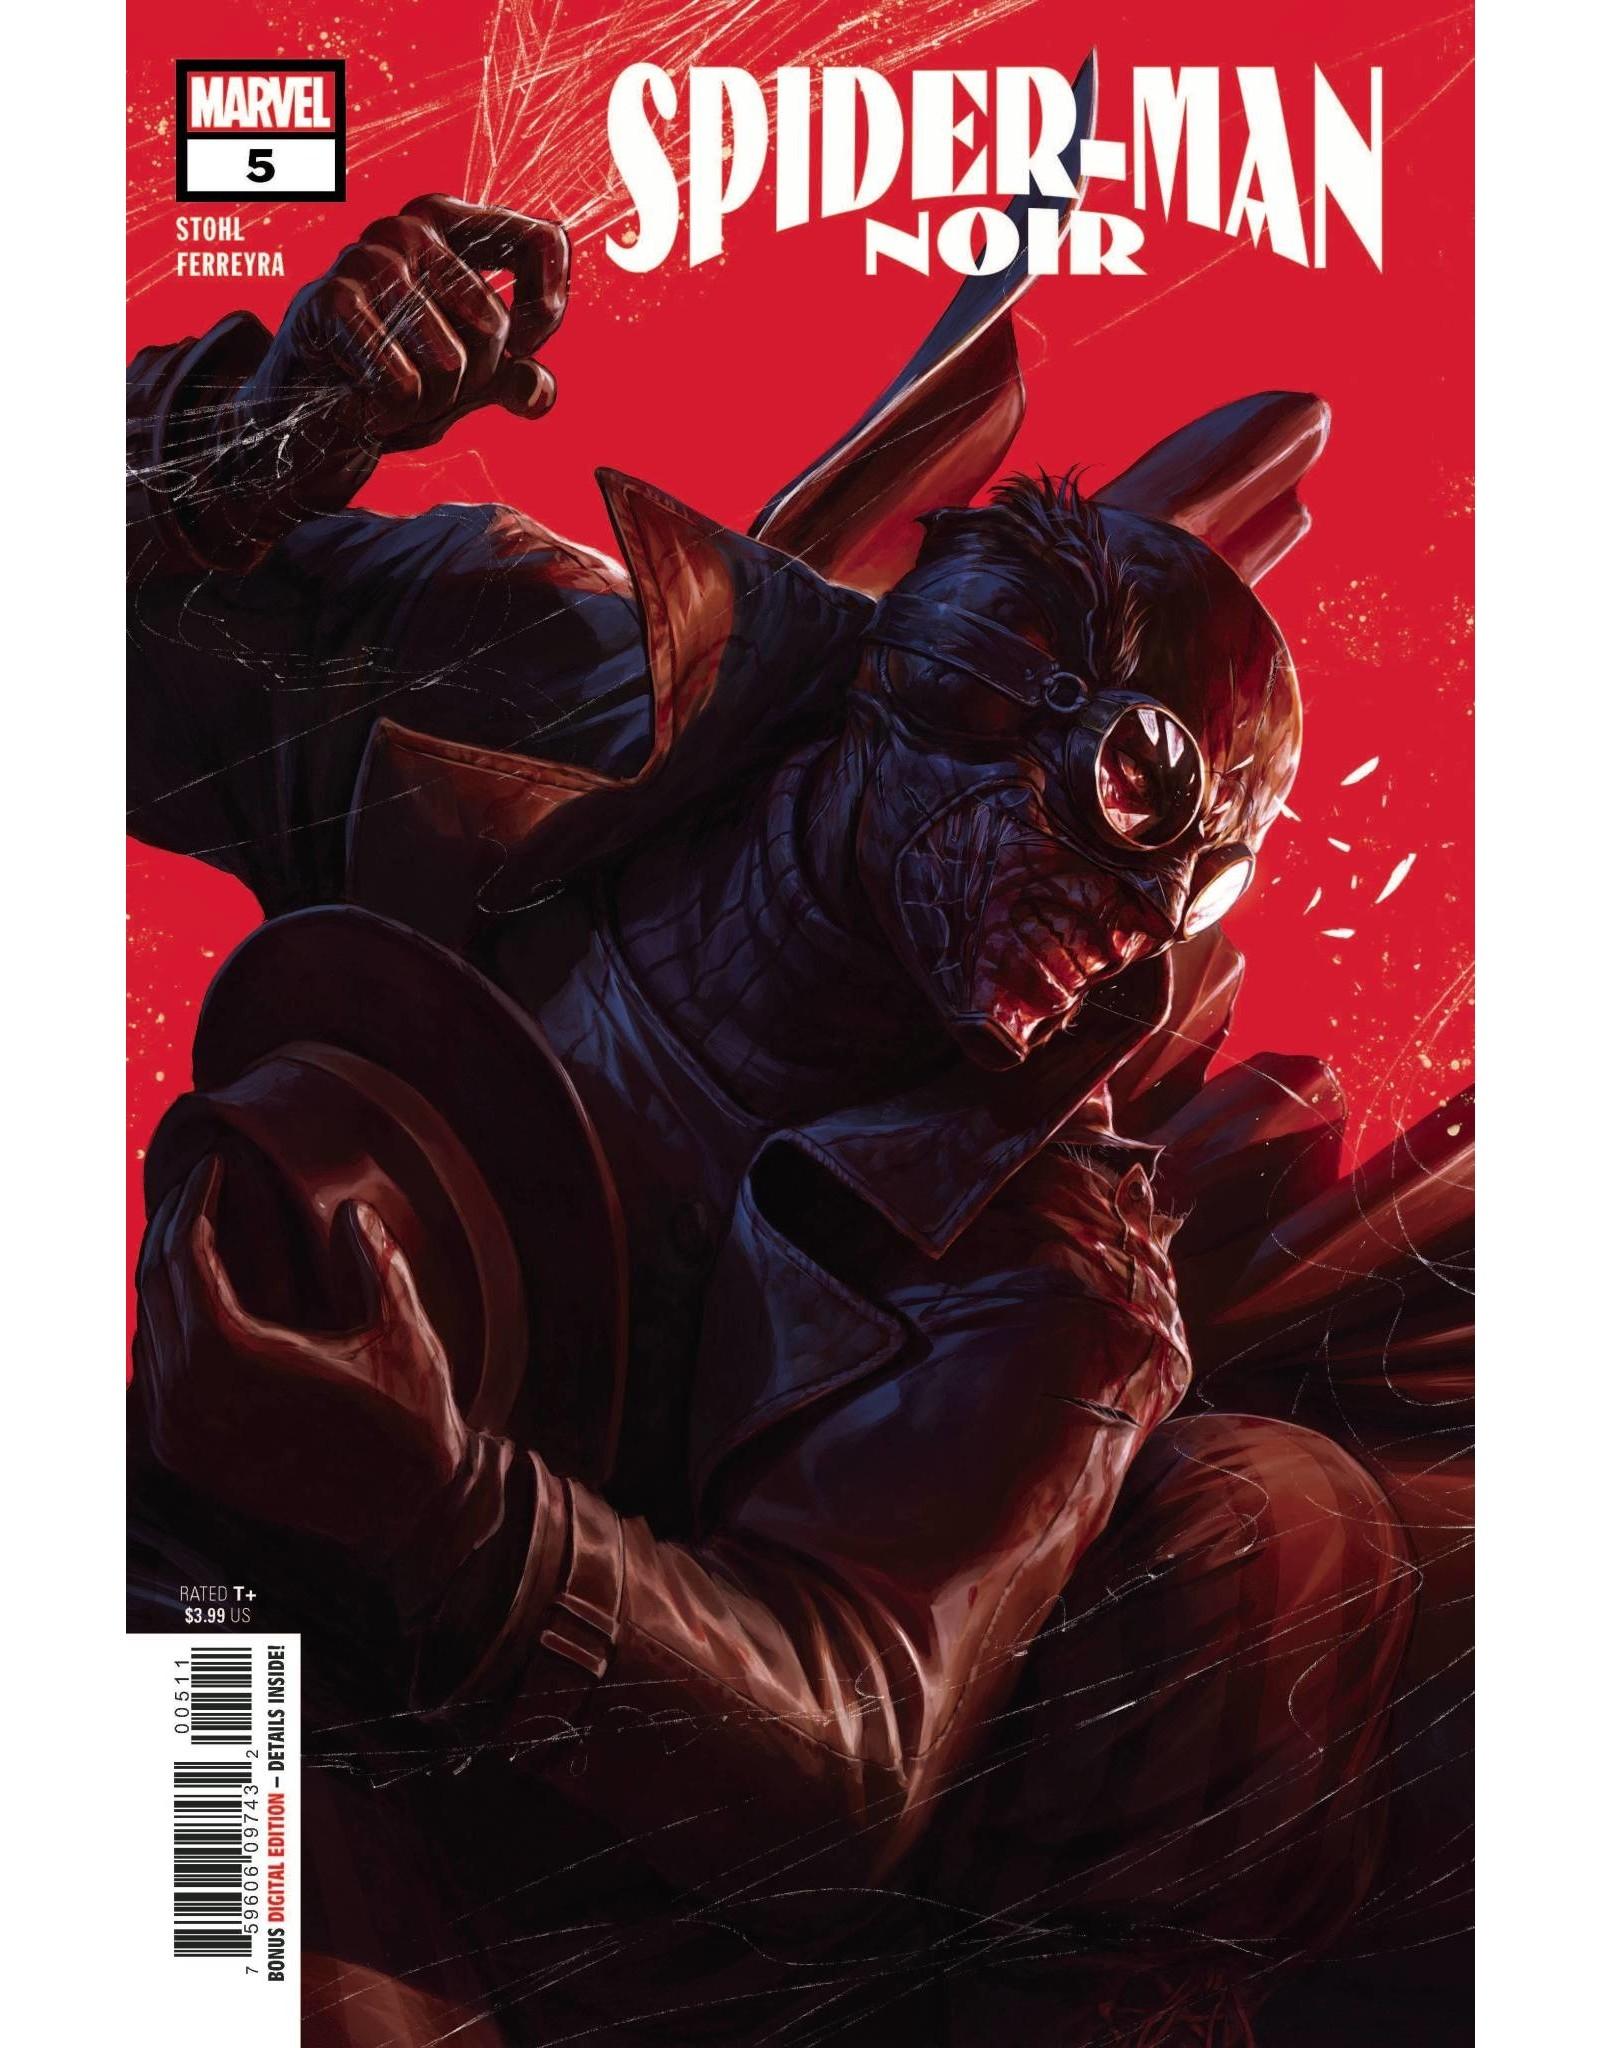 Marvel Comics SPIDER-MAN NOIR #5 (OF 5)